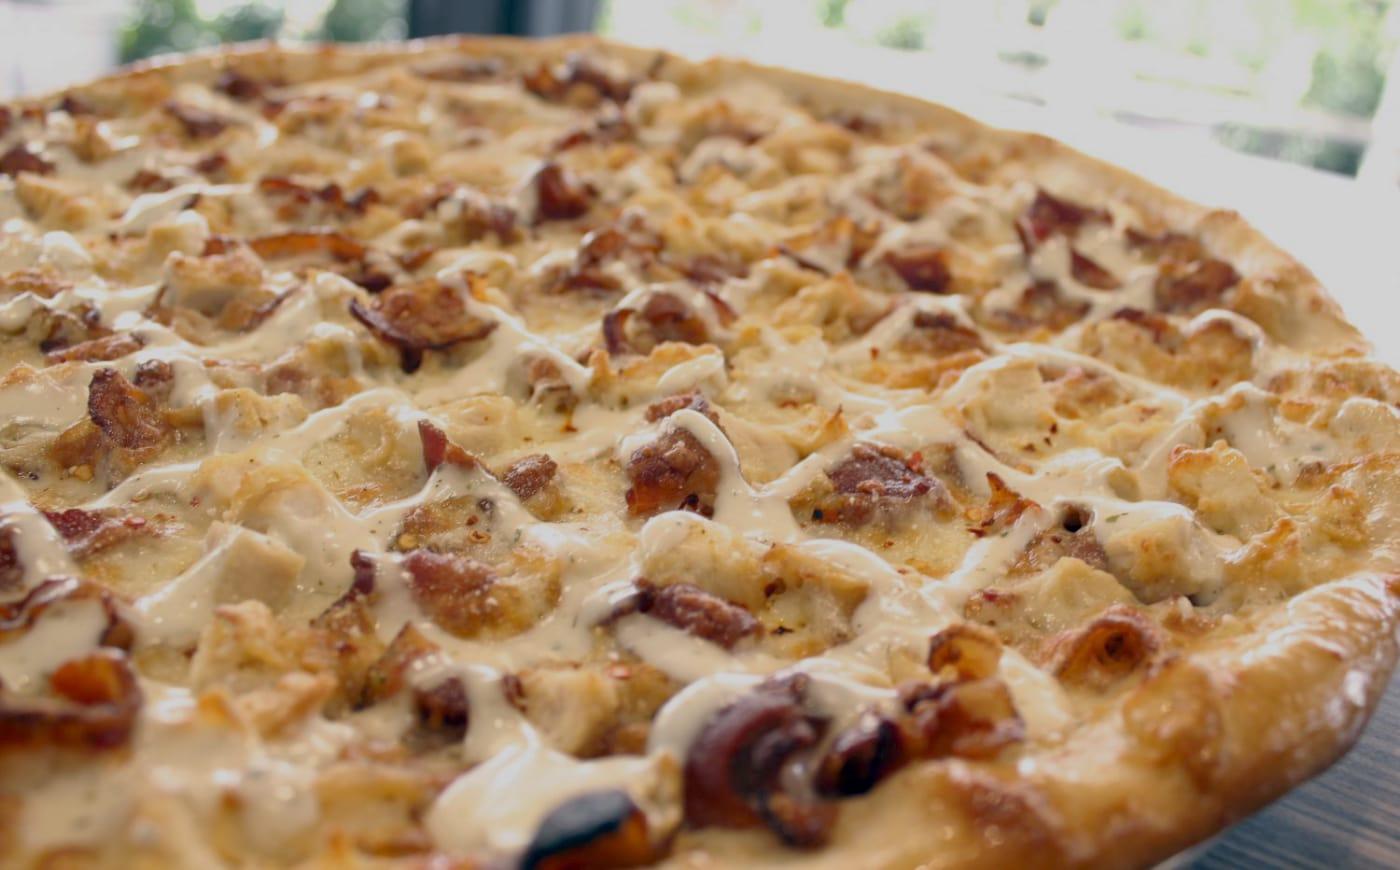 Signature chicken bacon ranch pizza.